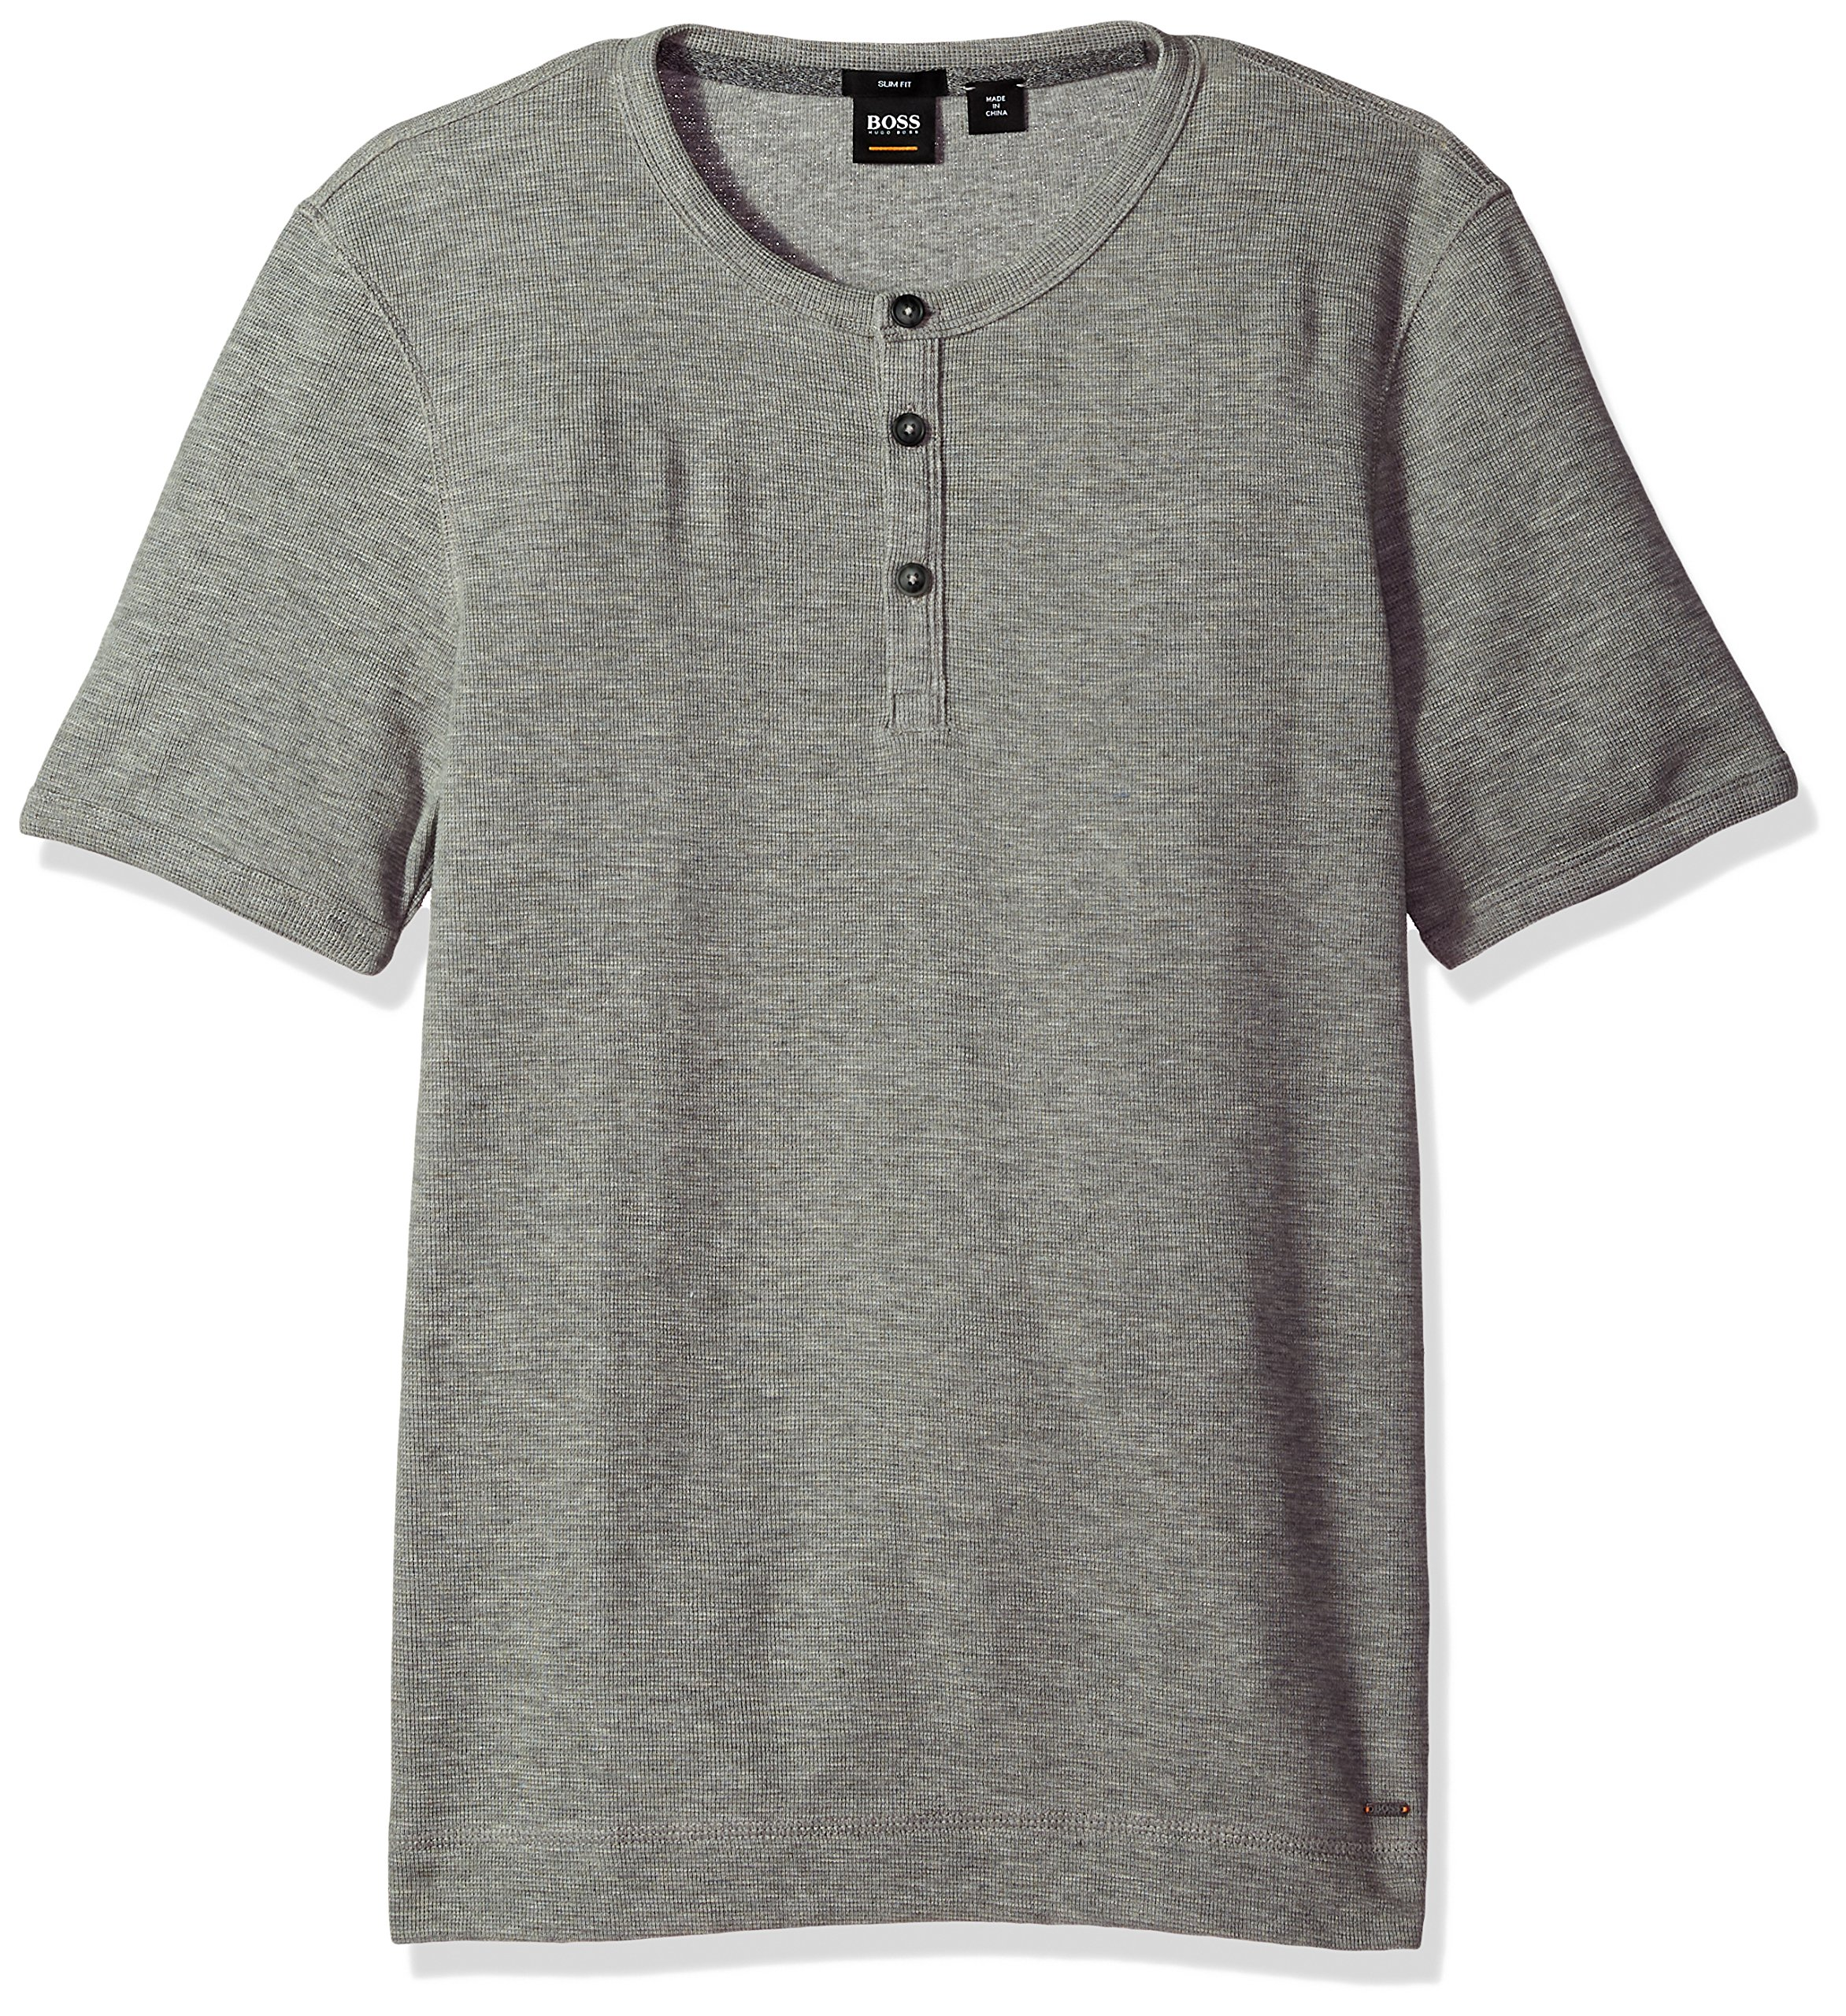 BOSS Orange Men's Short Sleeve Cotton Waffle Henley, Gray, Medium